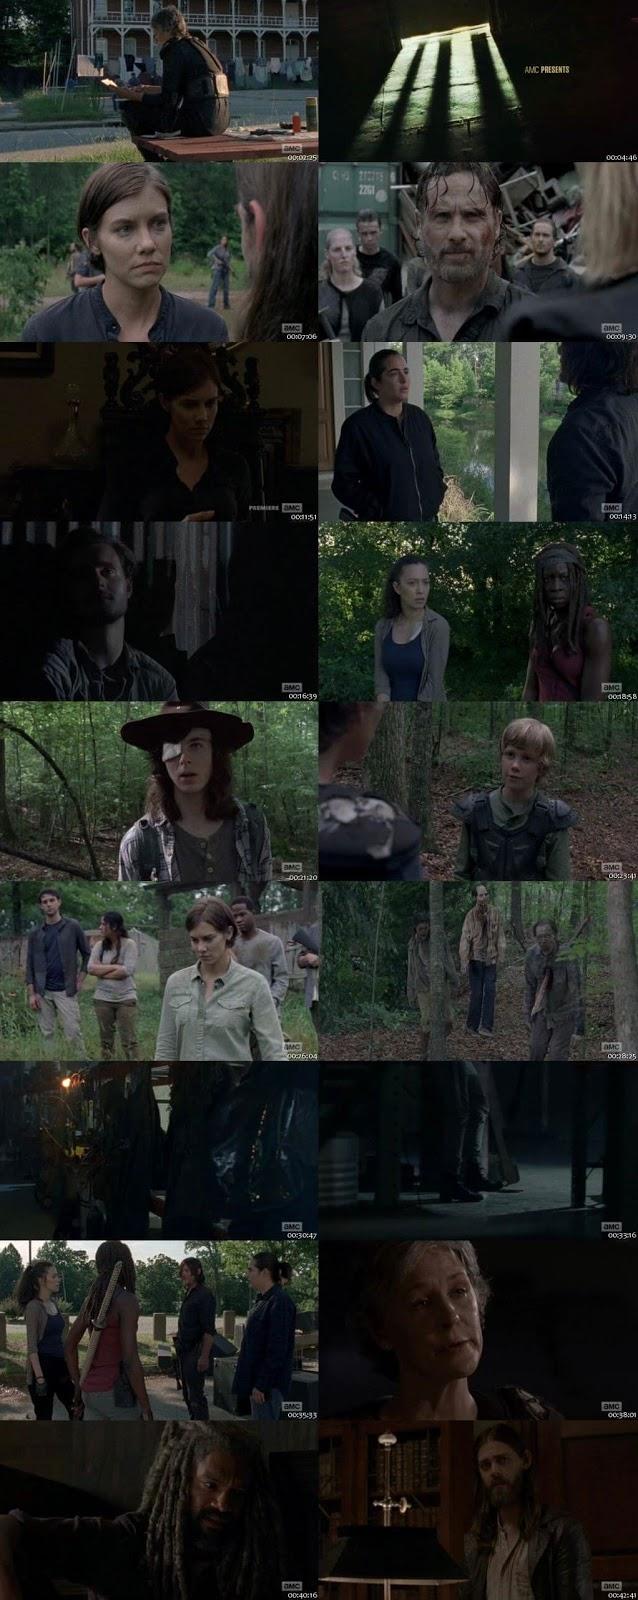 The Walking Dead S08E06 350MB HDTV 720p x264